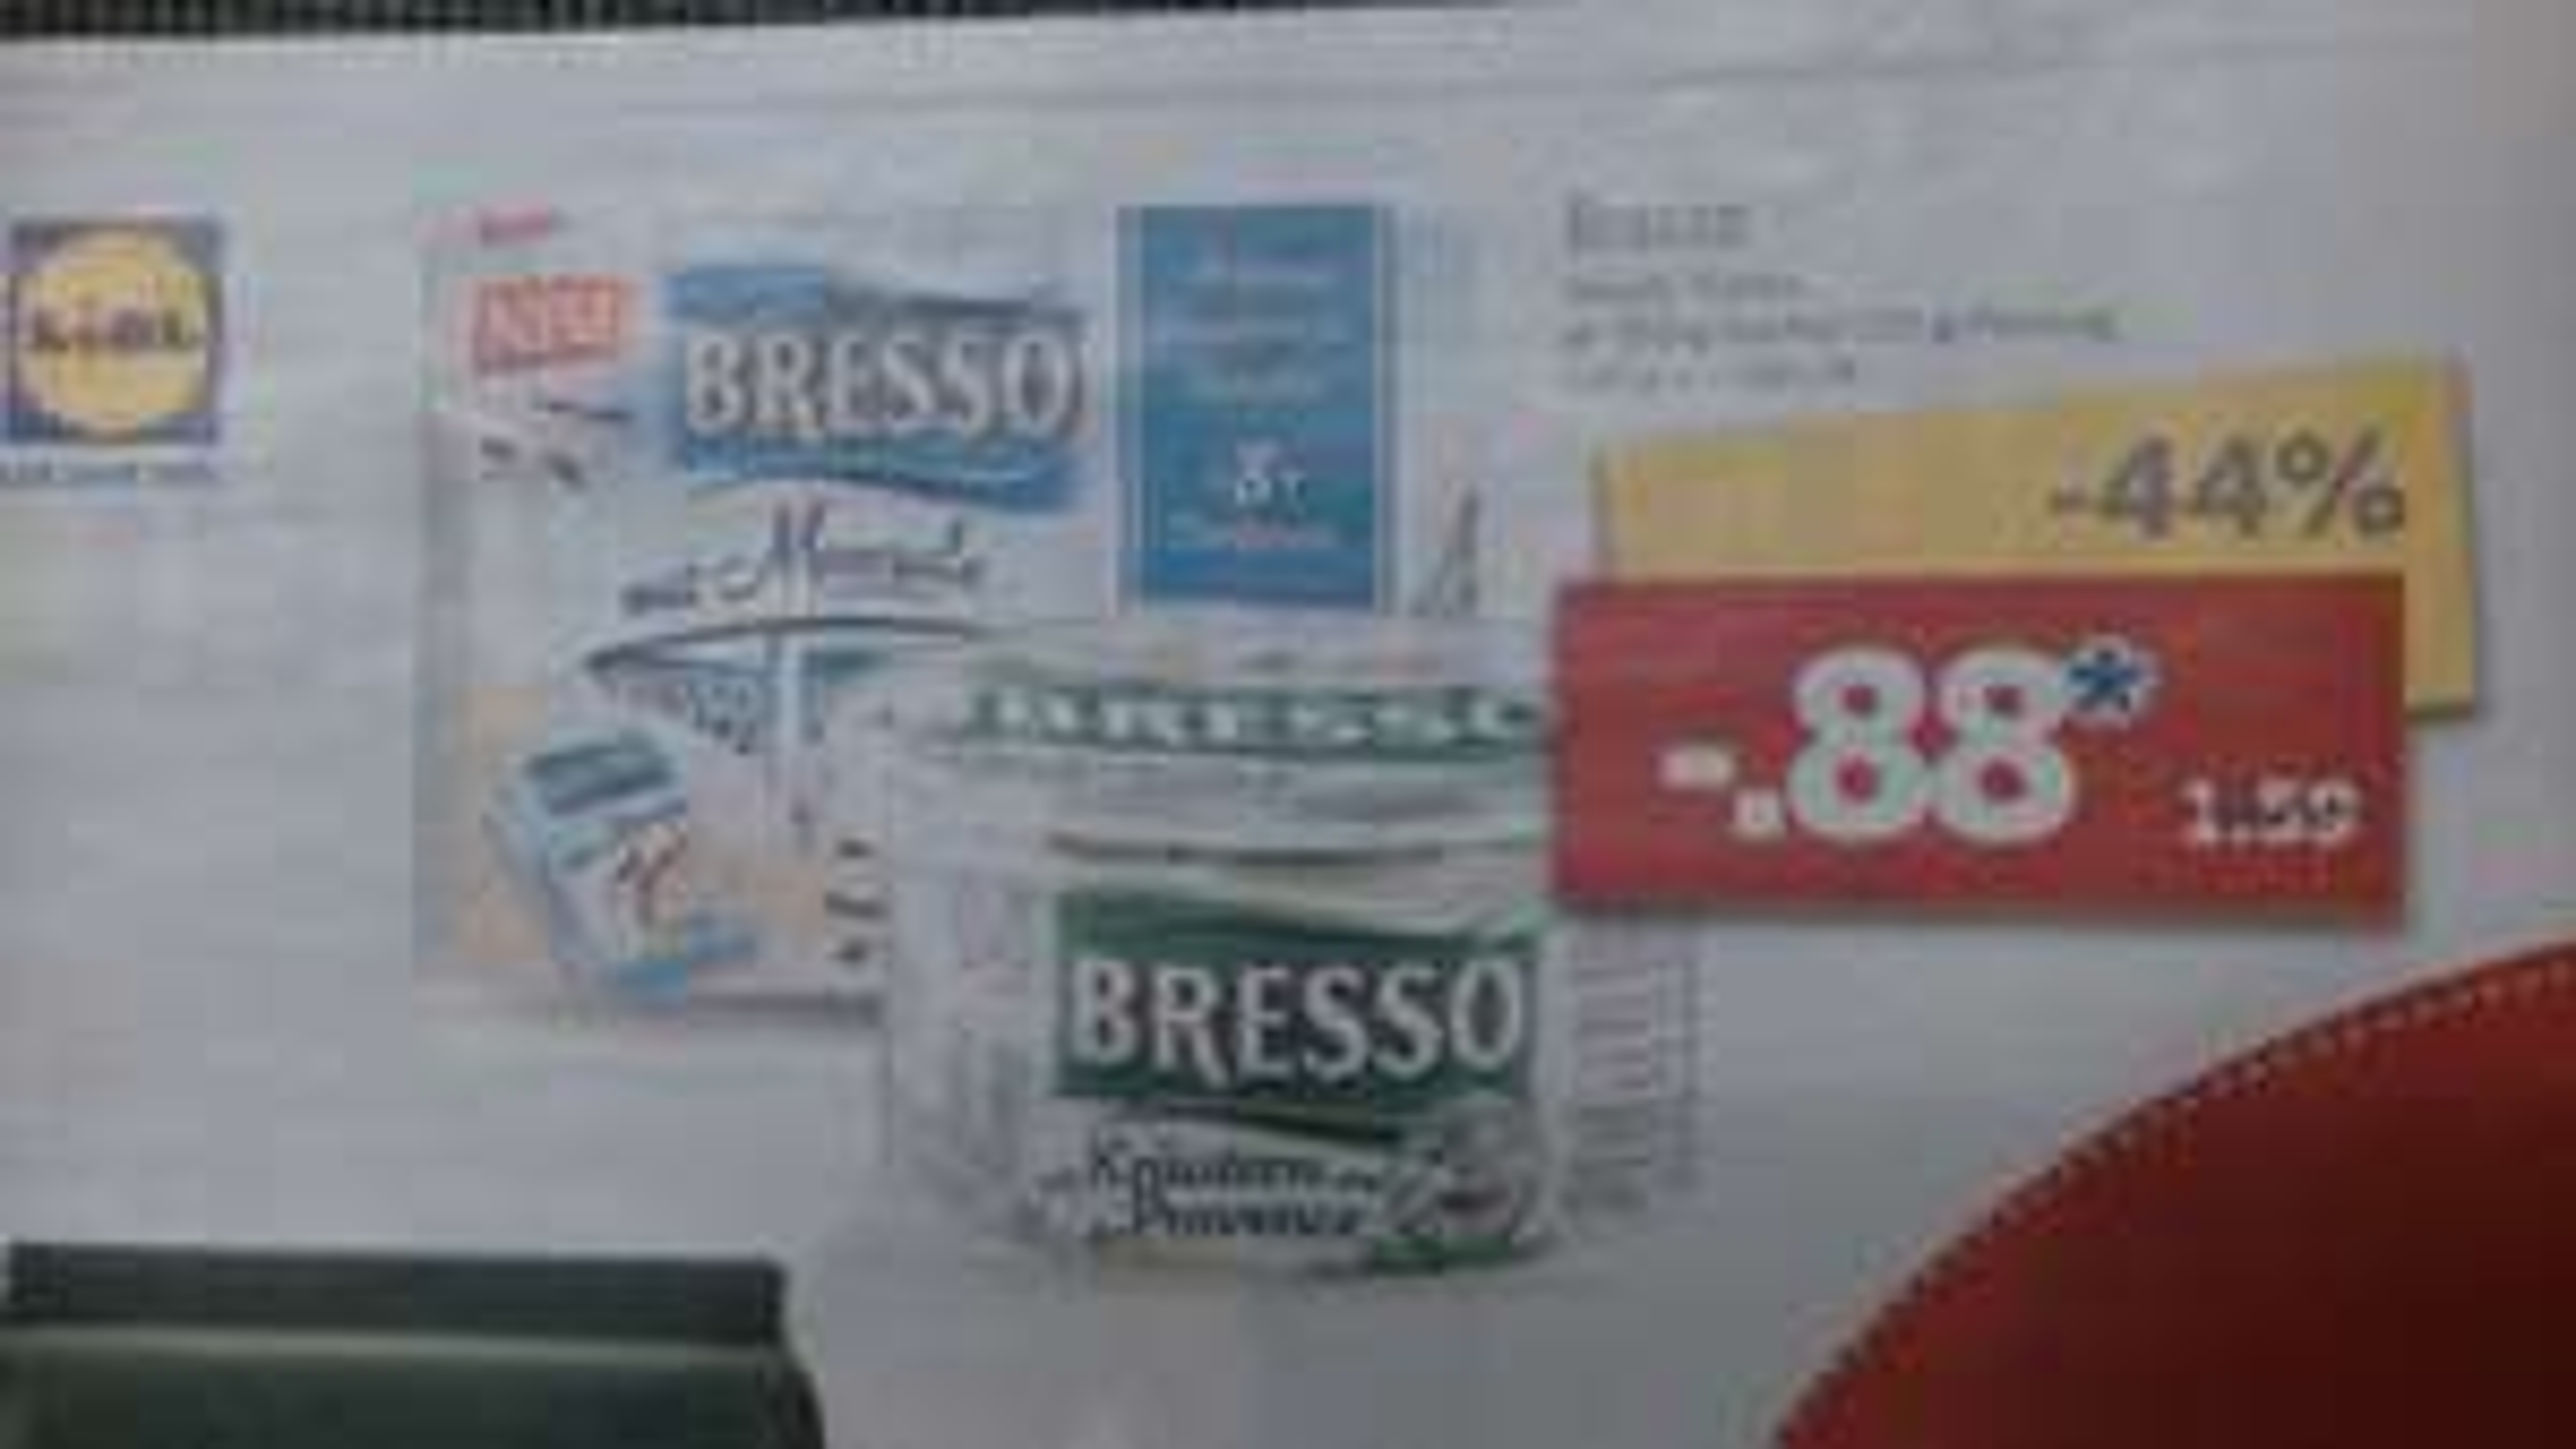 [LIDL] Bresso Frischkäse ab Montag den 23.01. - SB Coupon